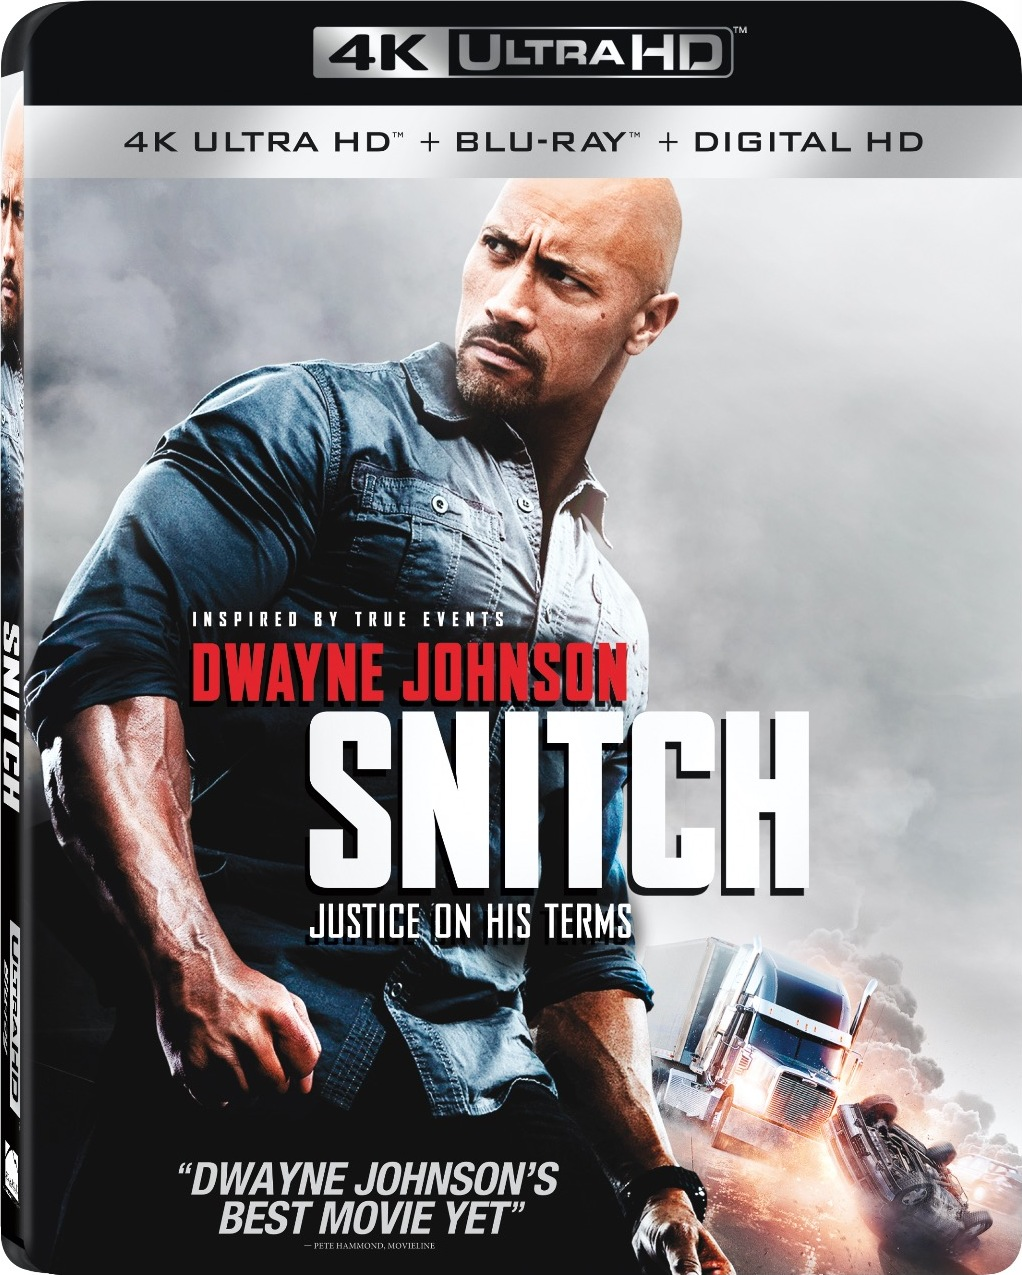 Snitch 4K (2013) UHD Ultra HD Blu-ray